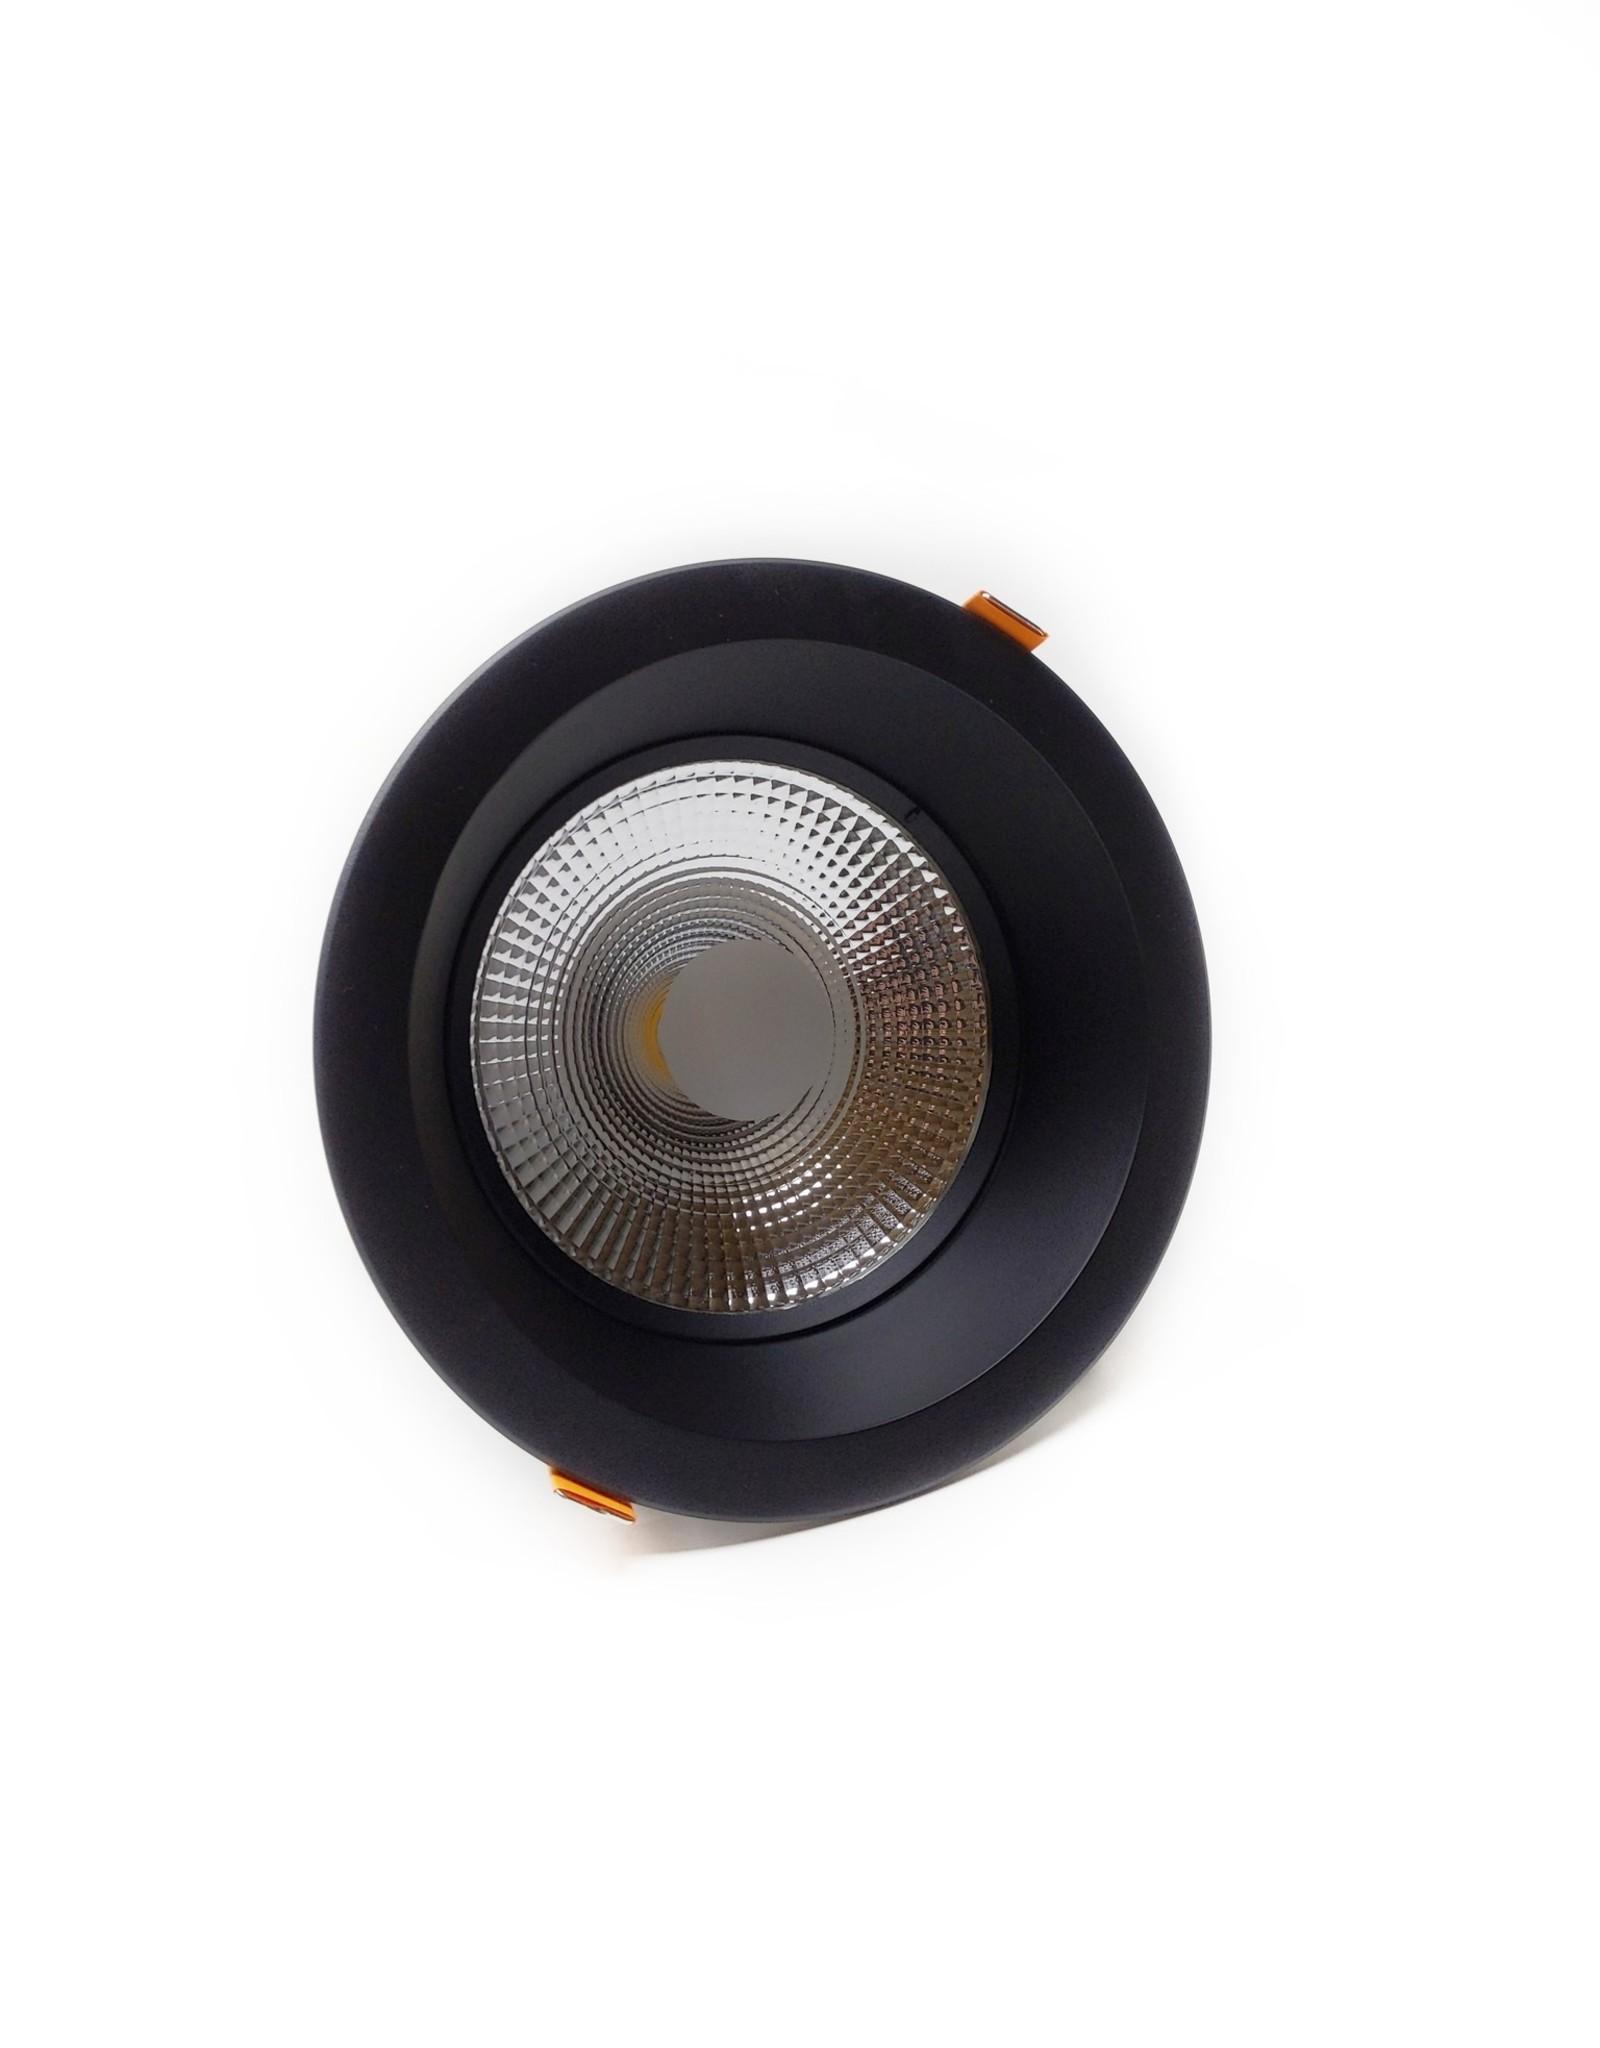 LedLed Glare Dowlight ZWART 4000k 145mm 8-12W gatmaat 120mm